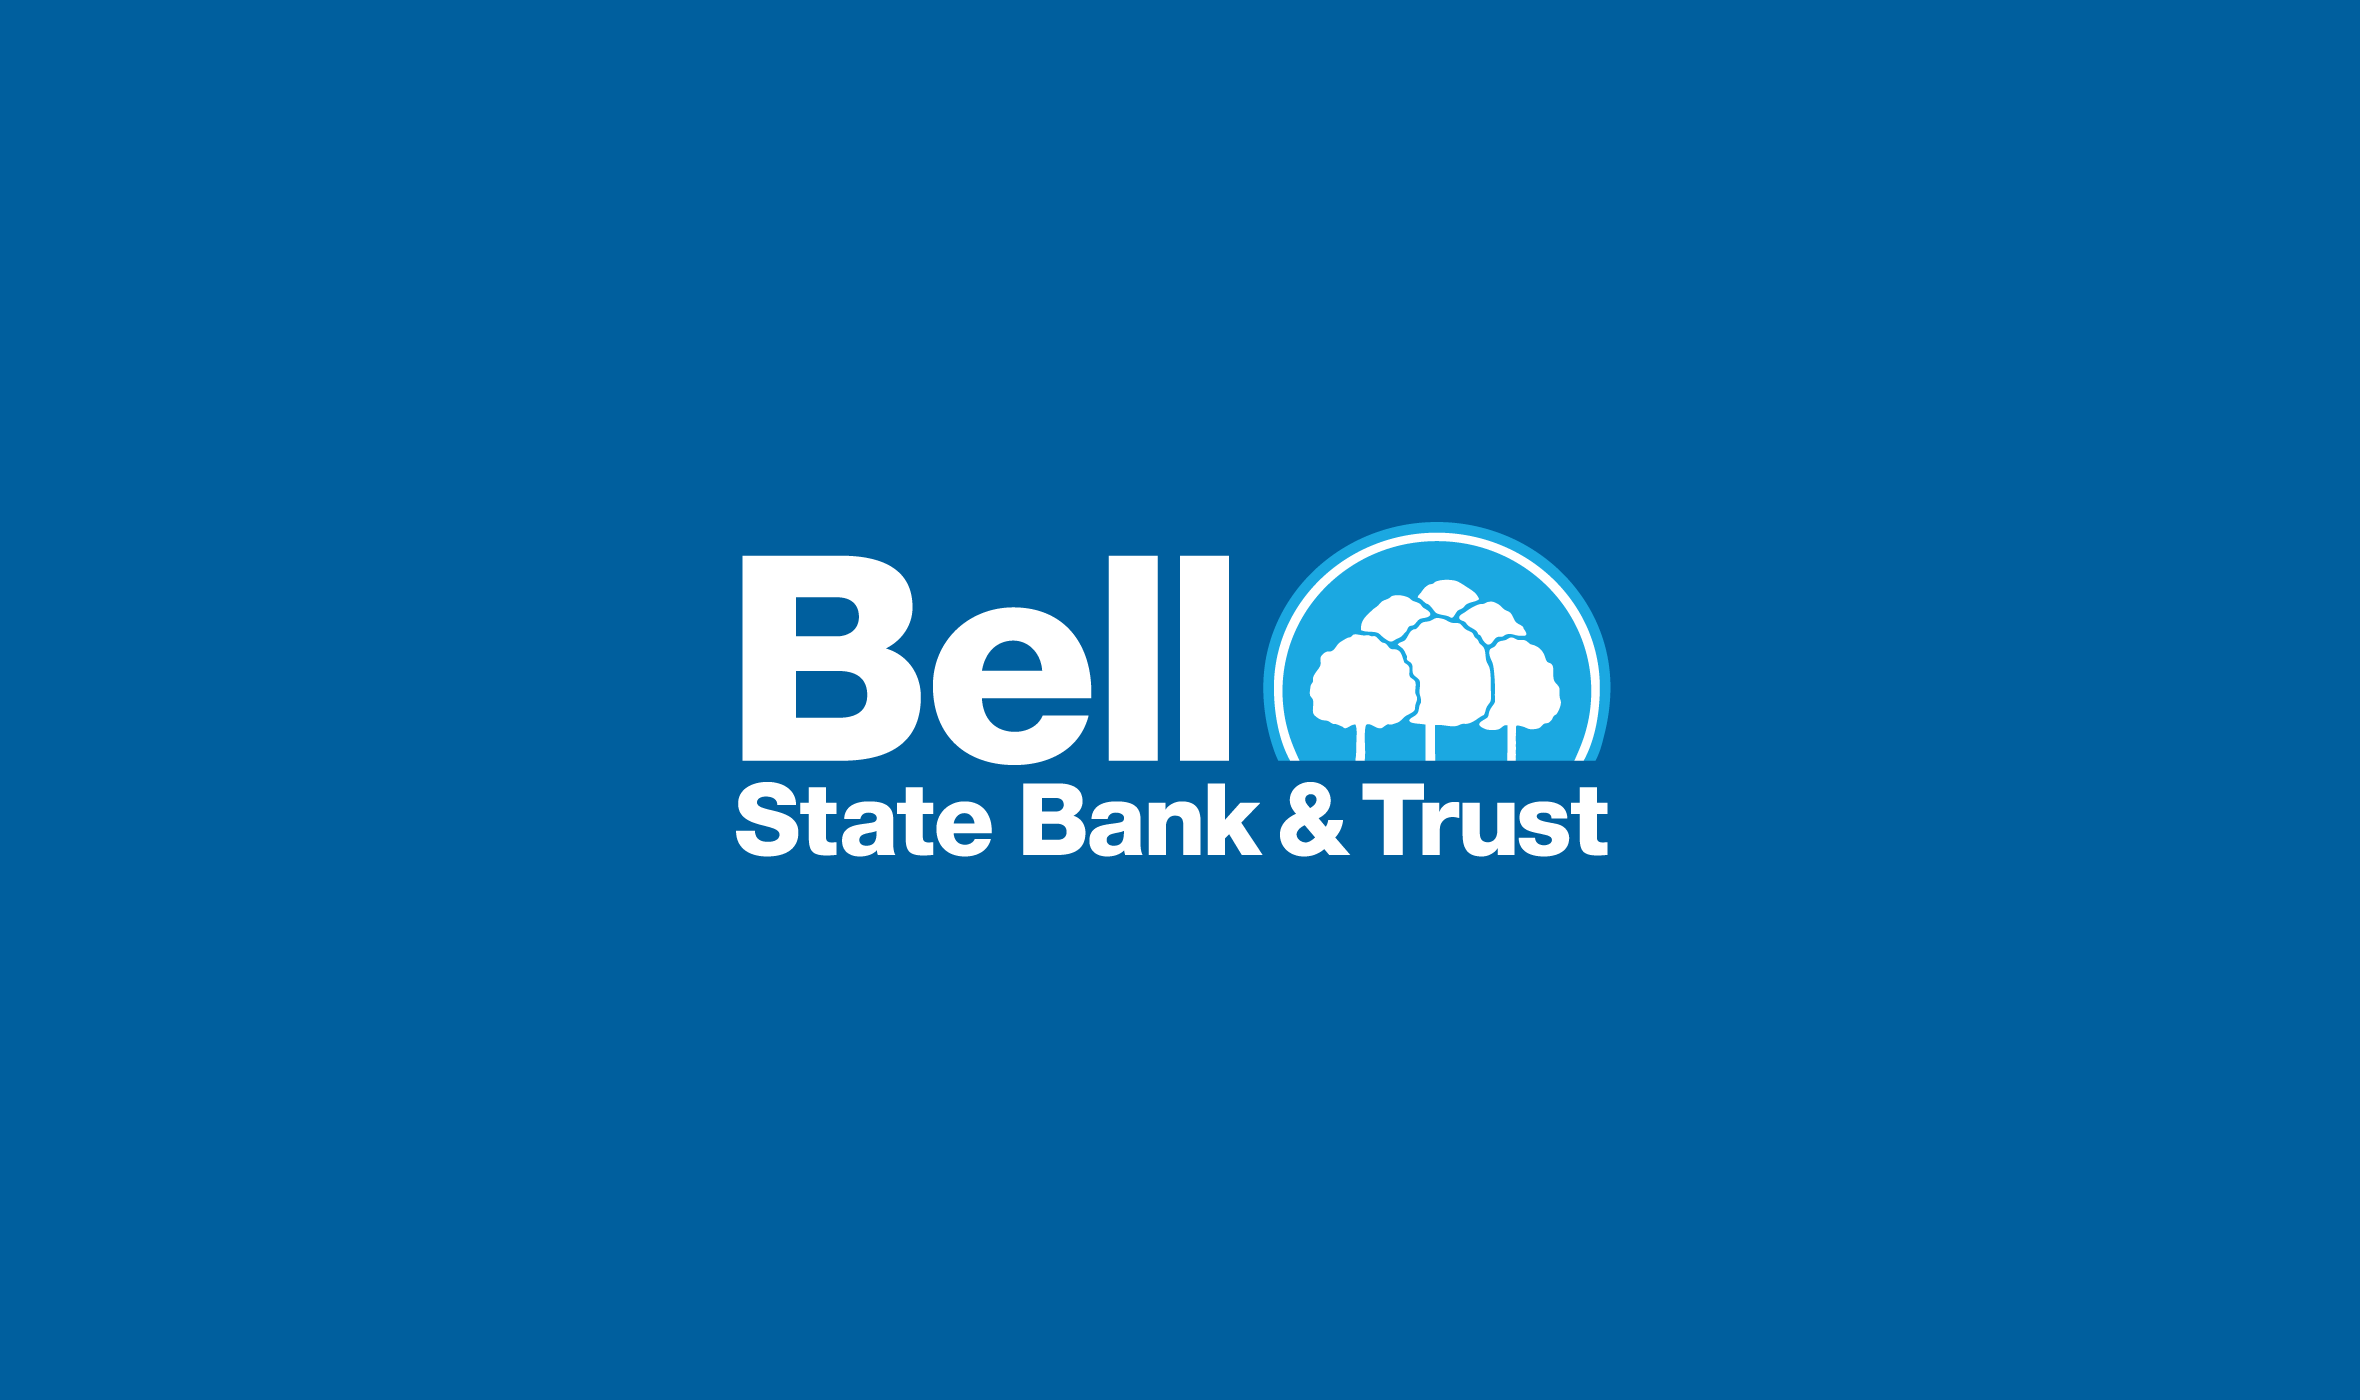 Bell State Bank Amp Trust Charpentier Creative Charpentier